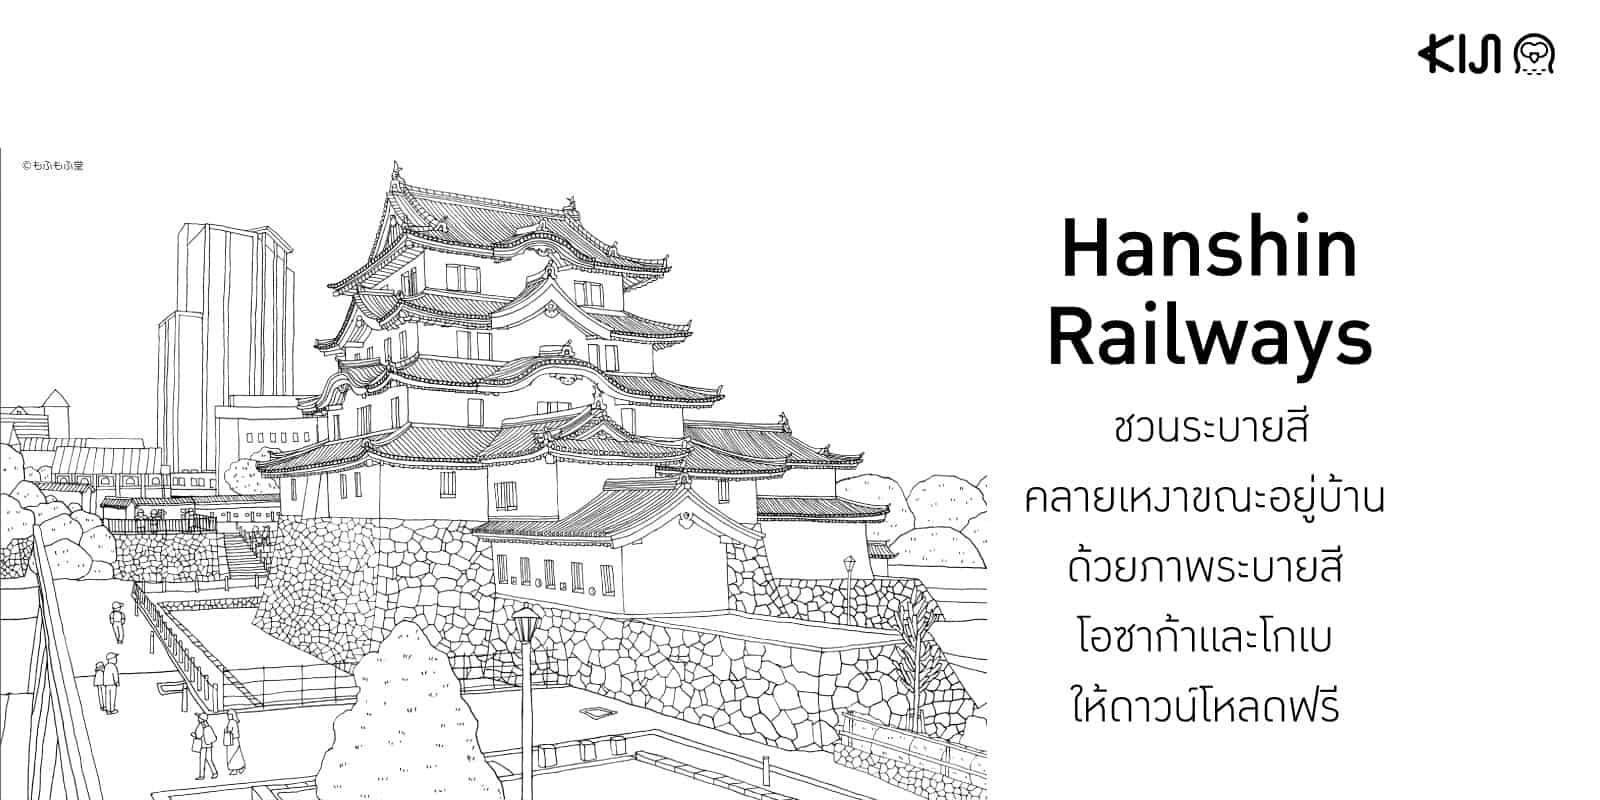 Hanshin Railways เปิดให้ดาวน์โหลดภาพระบายสีโอซาก้าและโกเบ